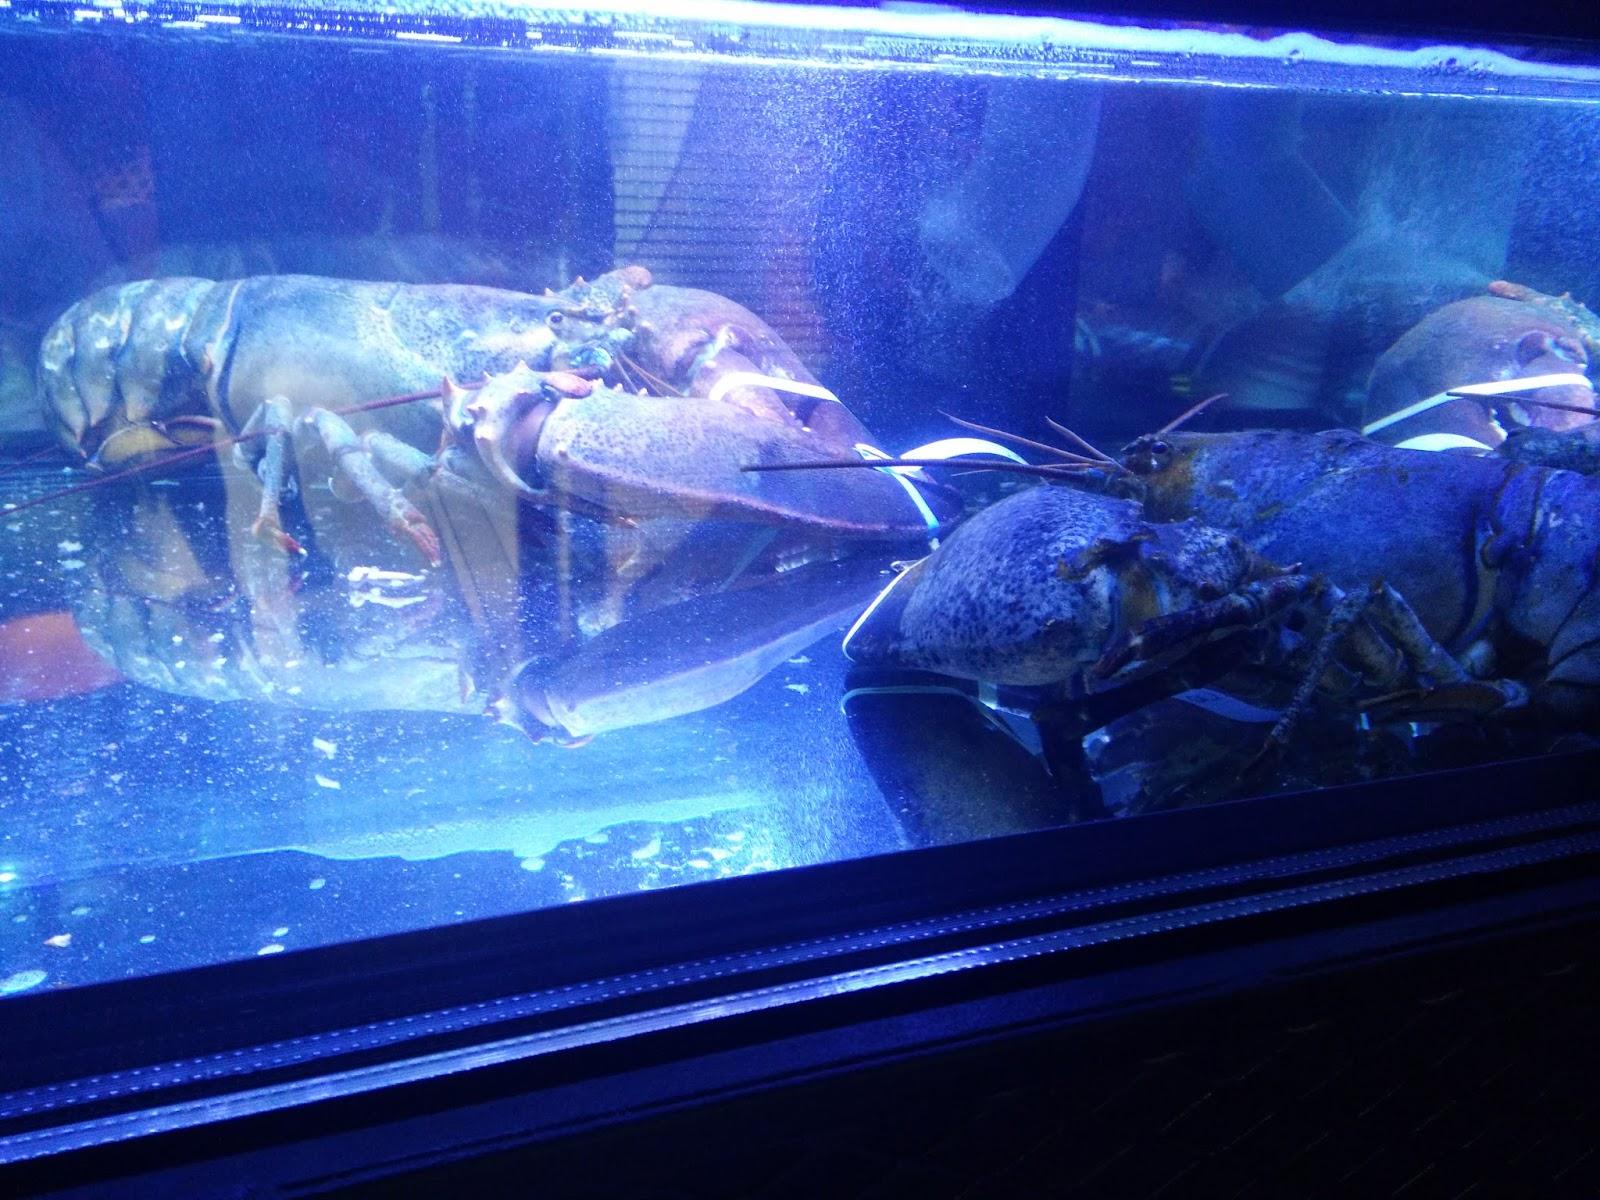 E-Wen Hooi: Burger & Lobster @ RW Genting